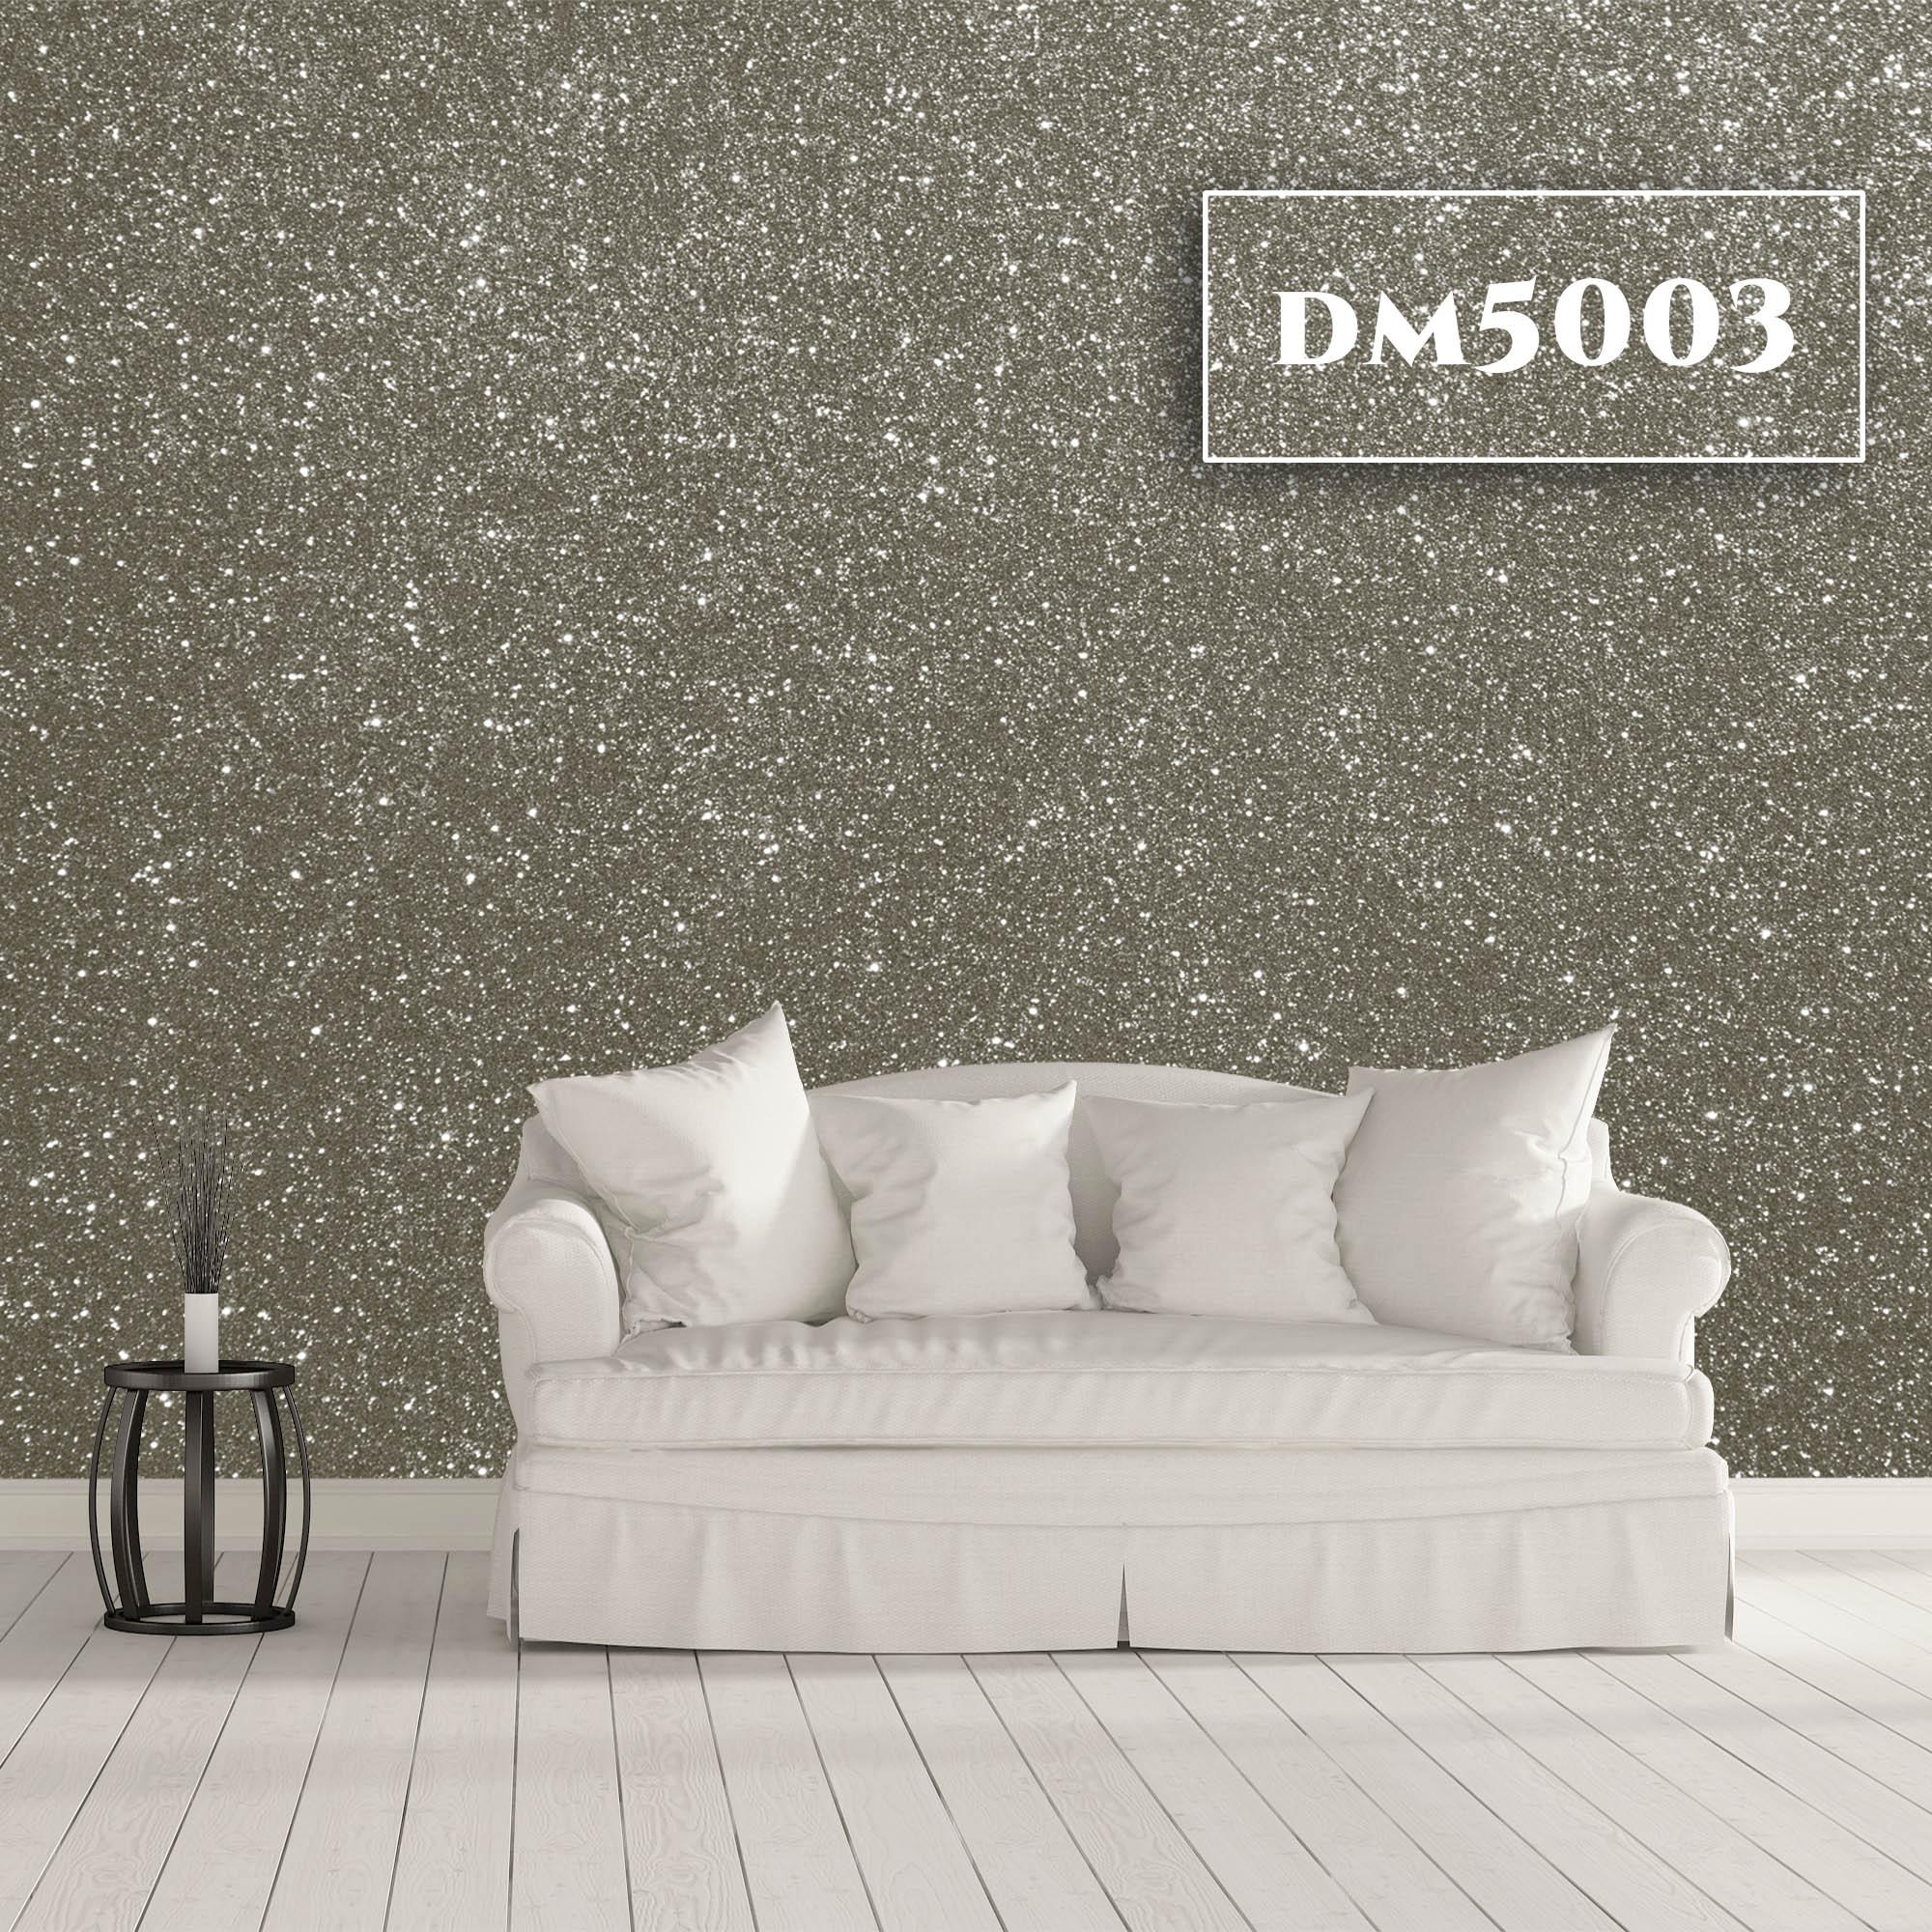 dm5003